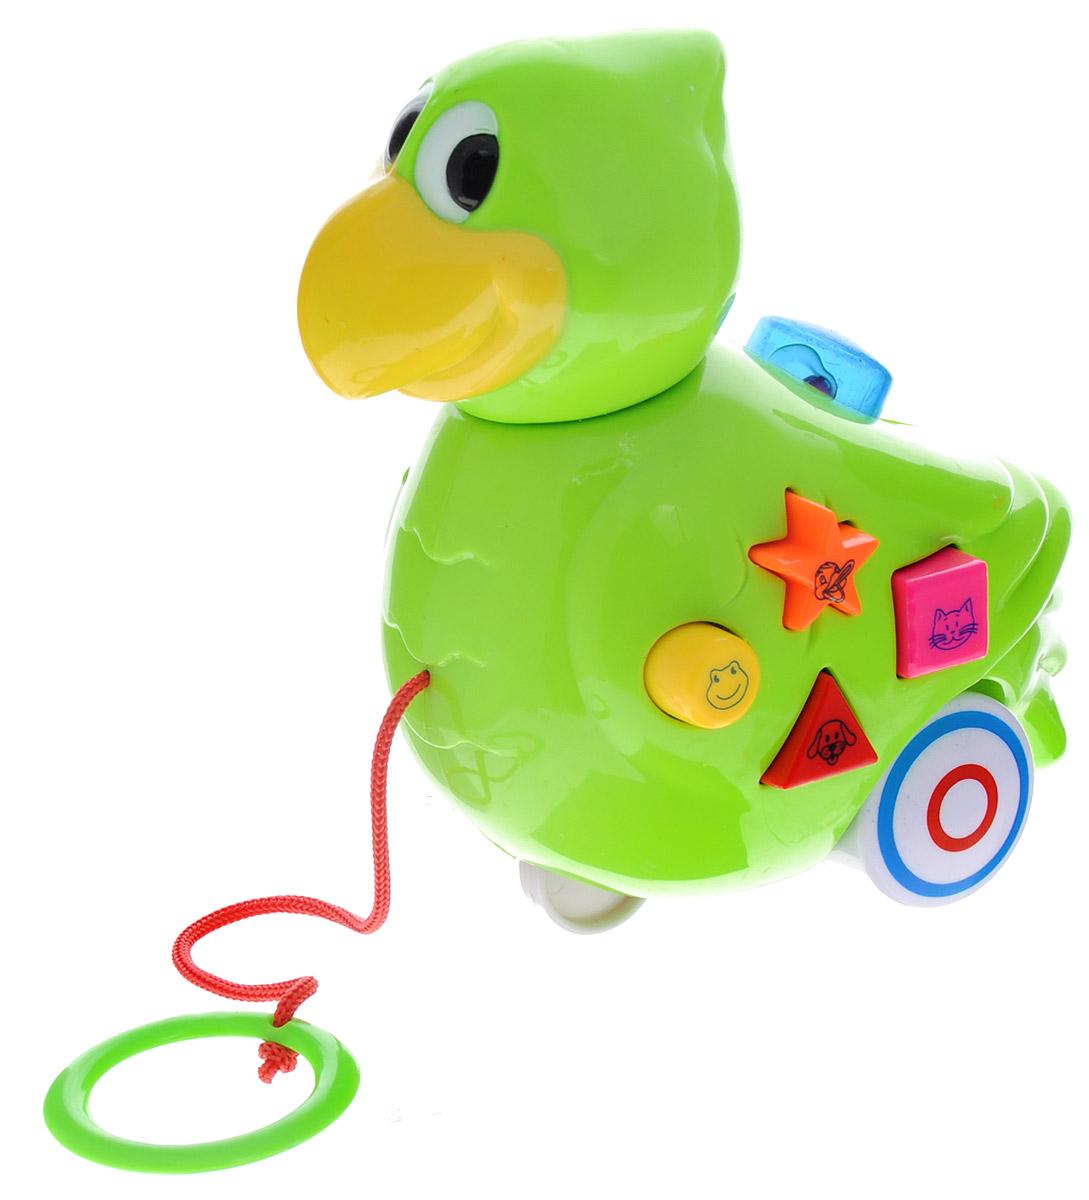 Mommy Love Игрушка-каталка Птичка строительный фен bosch phg 630 dce 060329c708